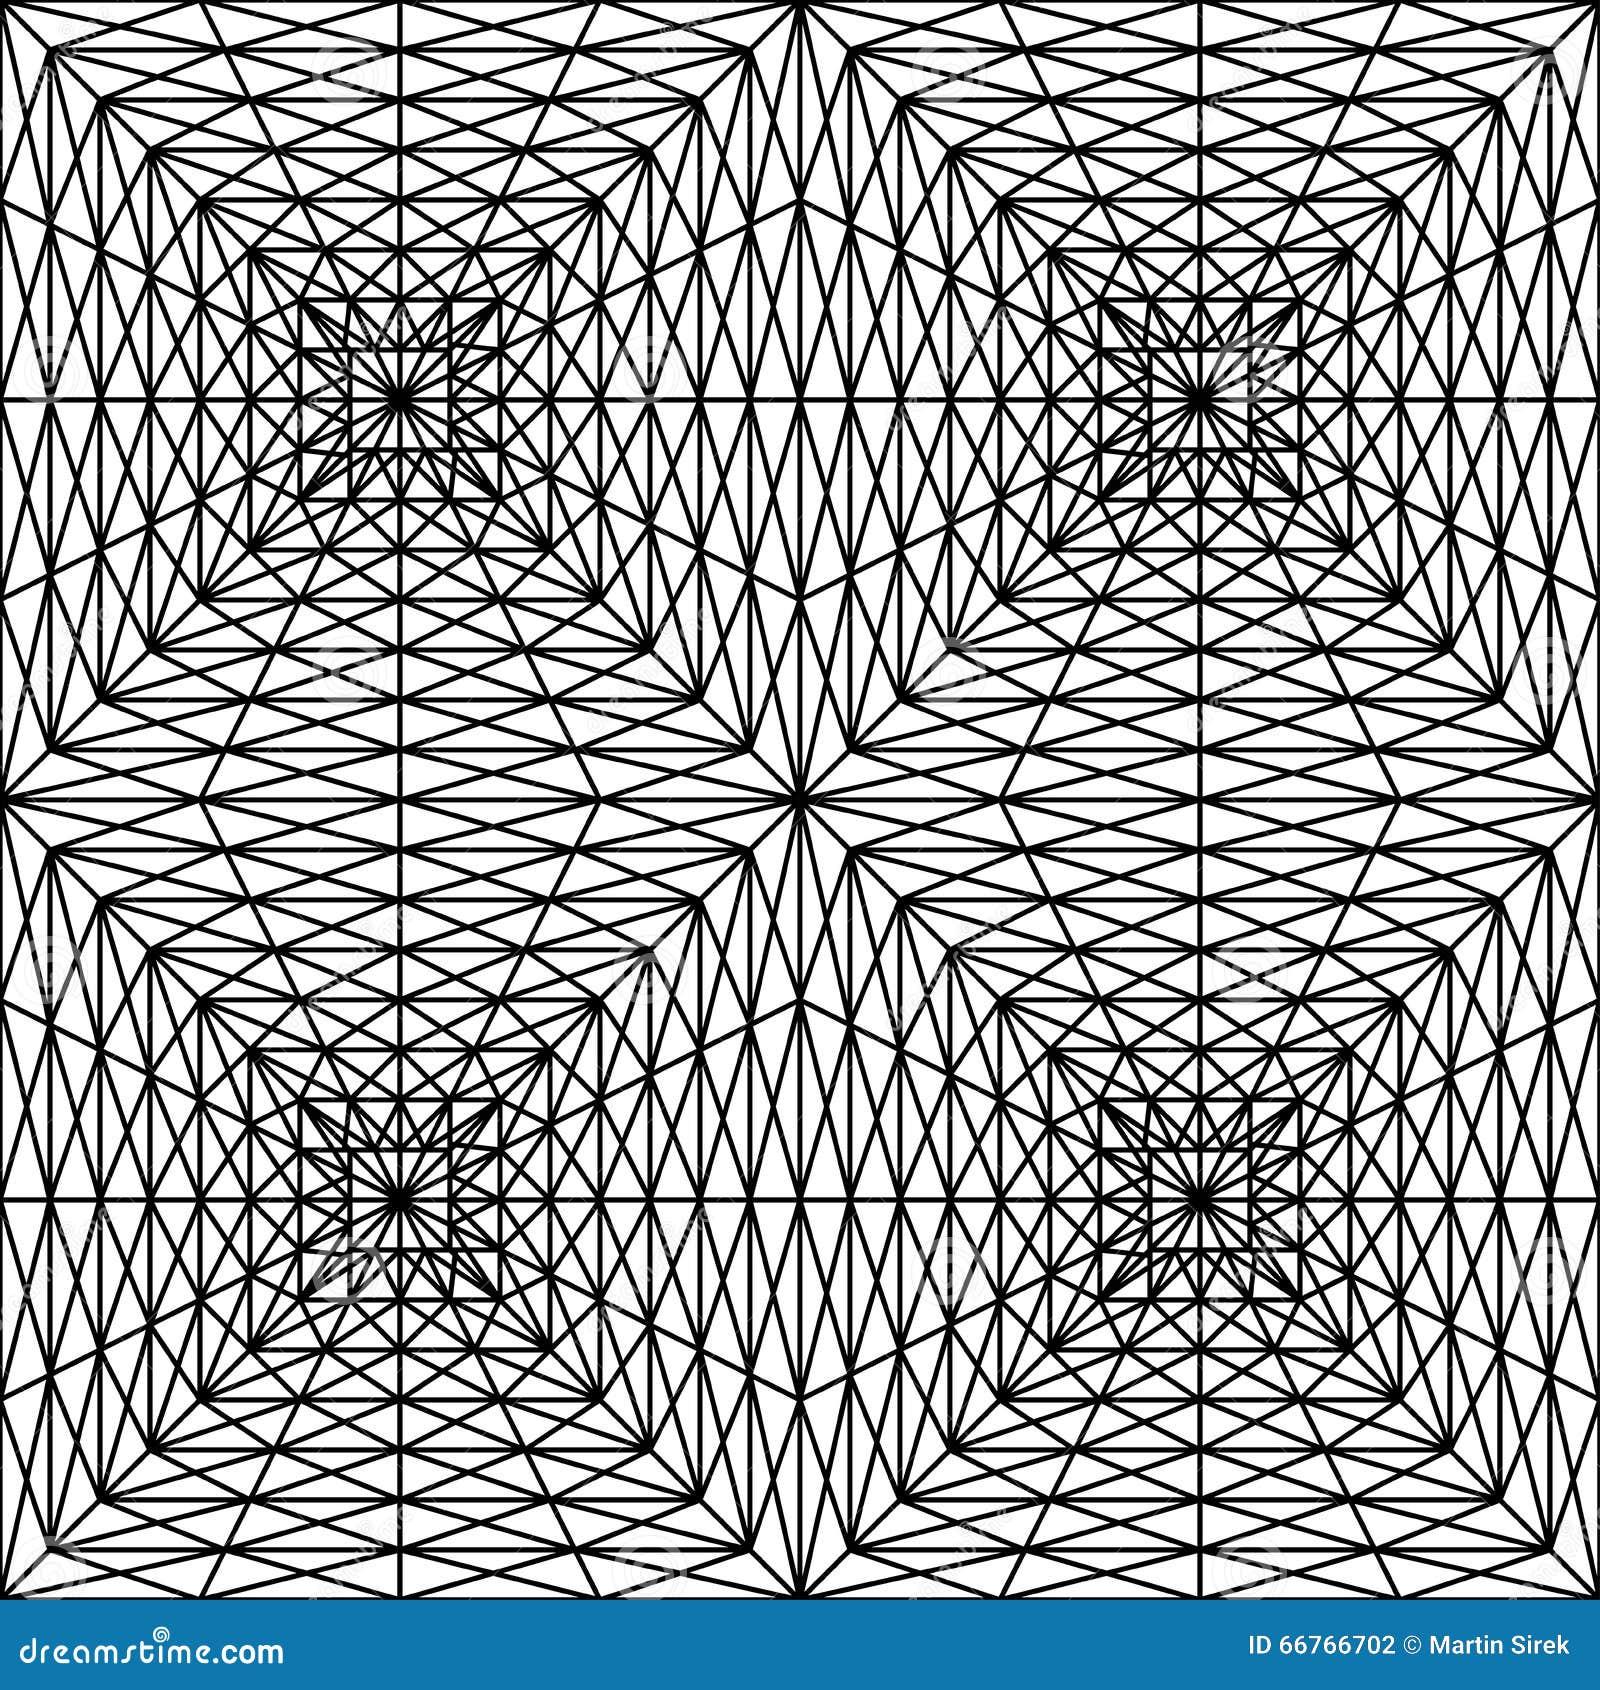 Vector Modern Seamless Geometry Pattern Squares 3d Black